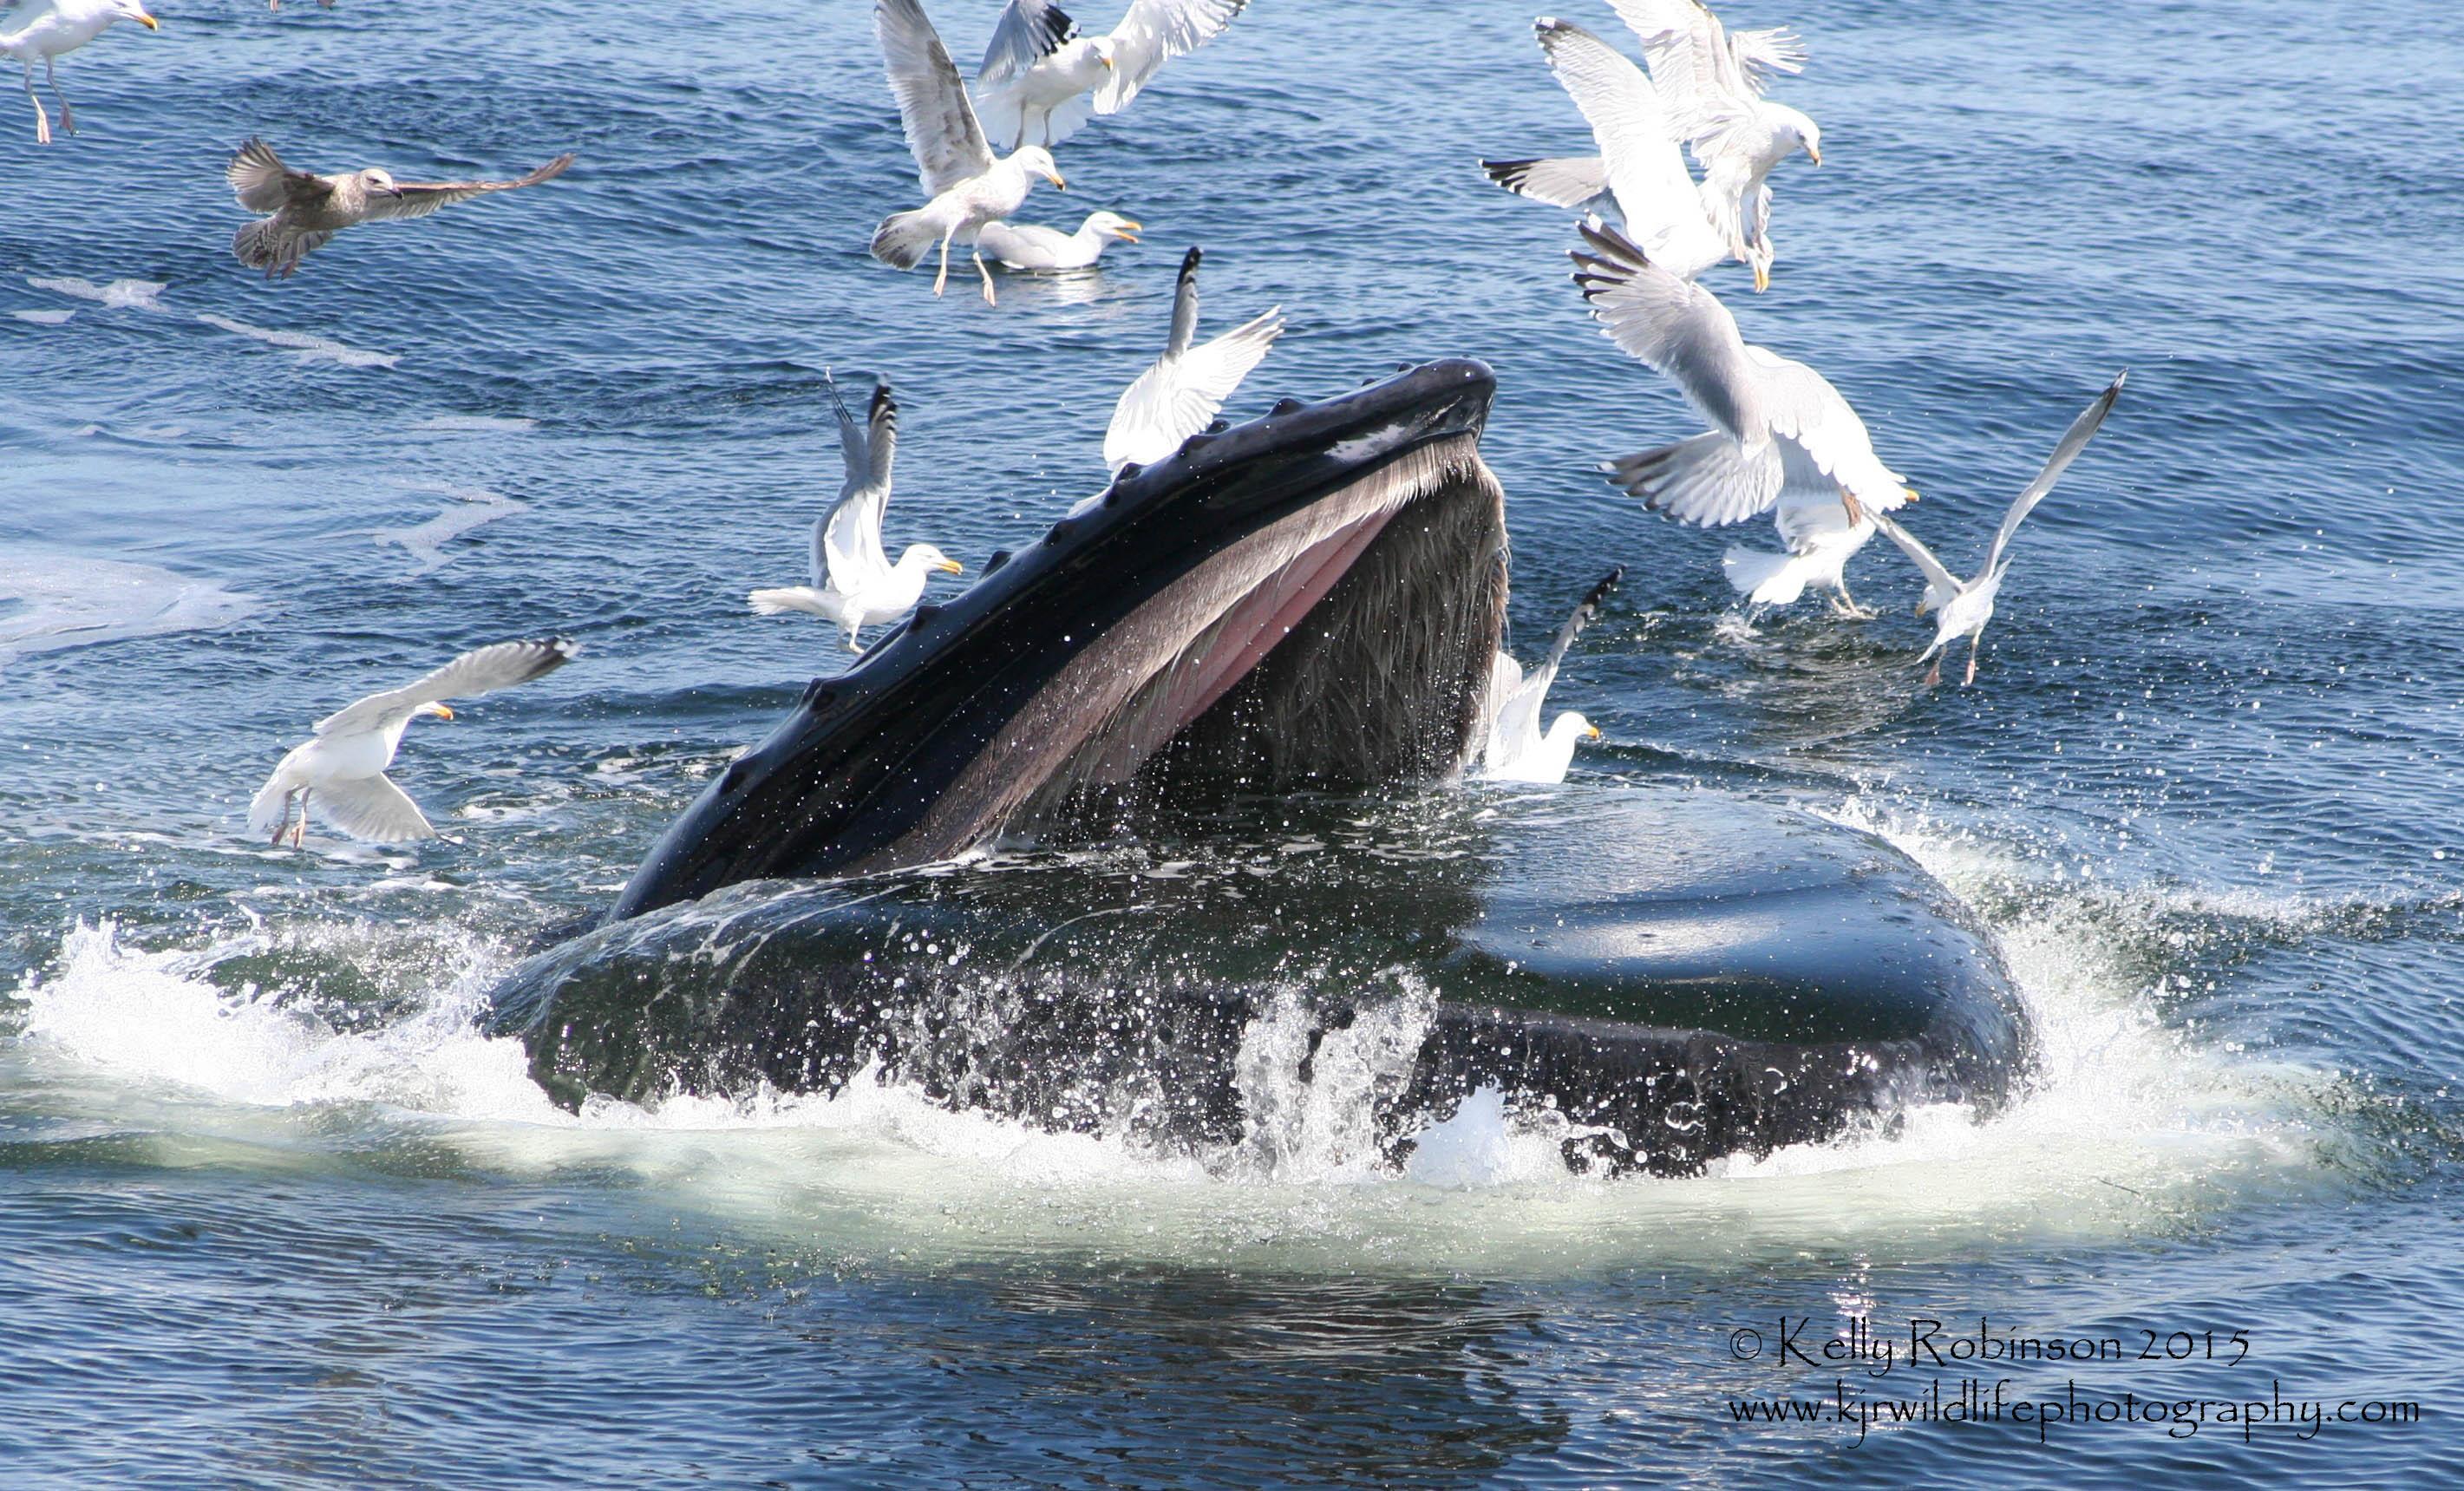 Humpback Whale (Etch-a-sktech) Feeding